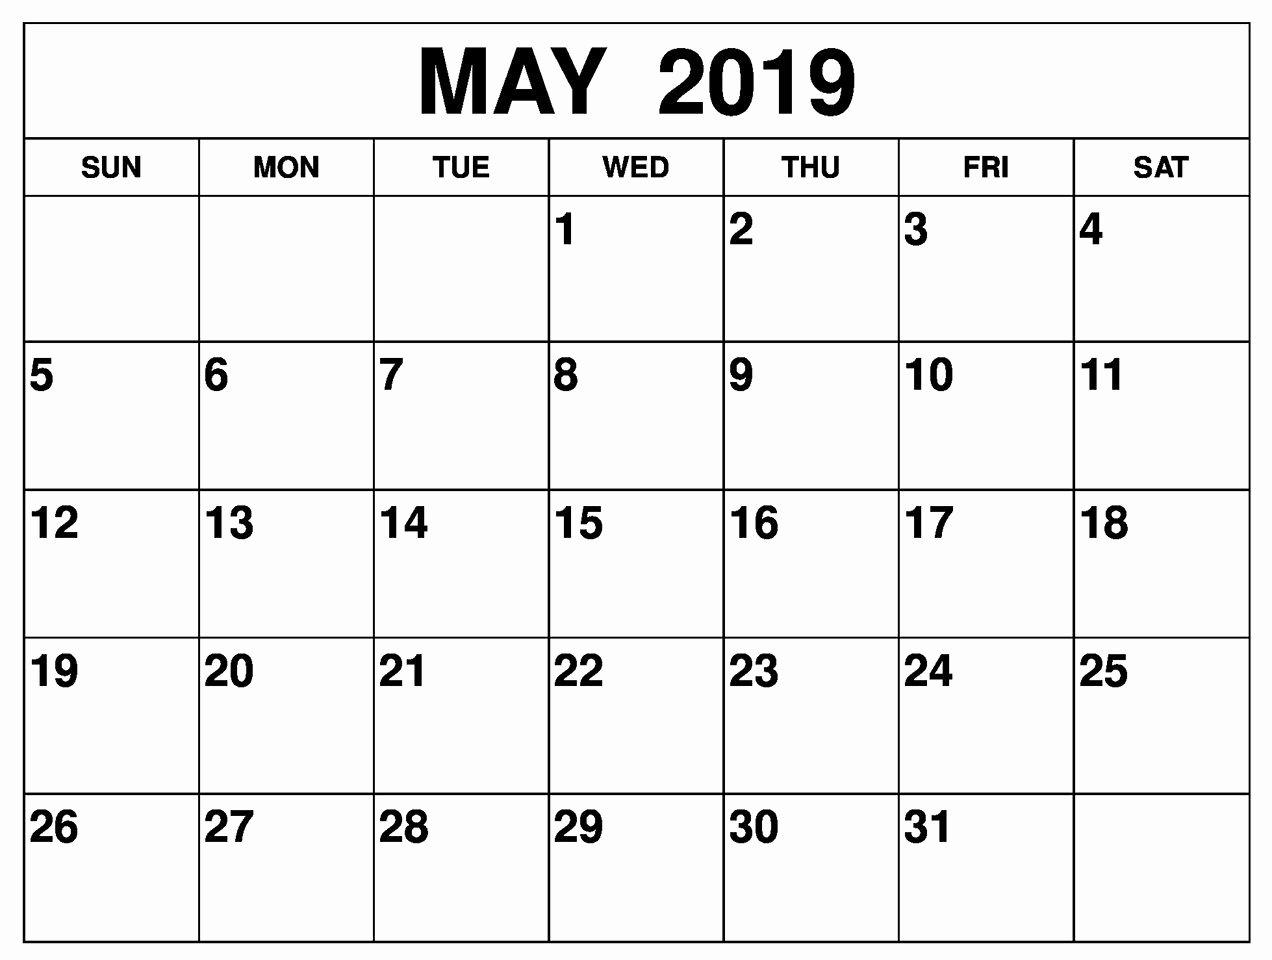 Free Printable Editable Calendar Best Of Free Printable May 2019 Calendar Editable